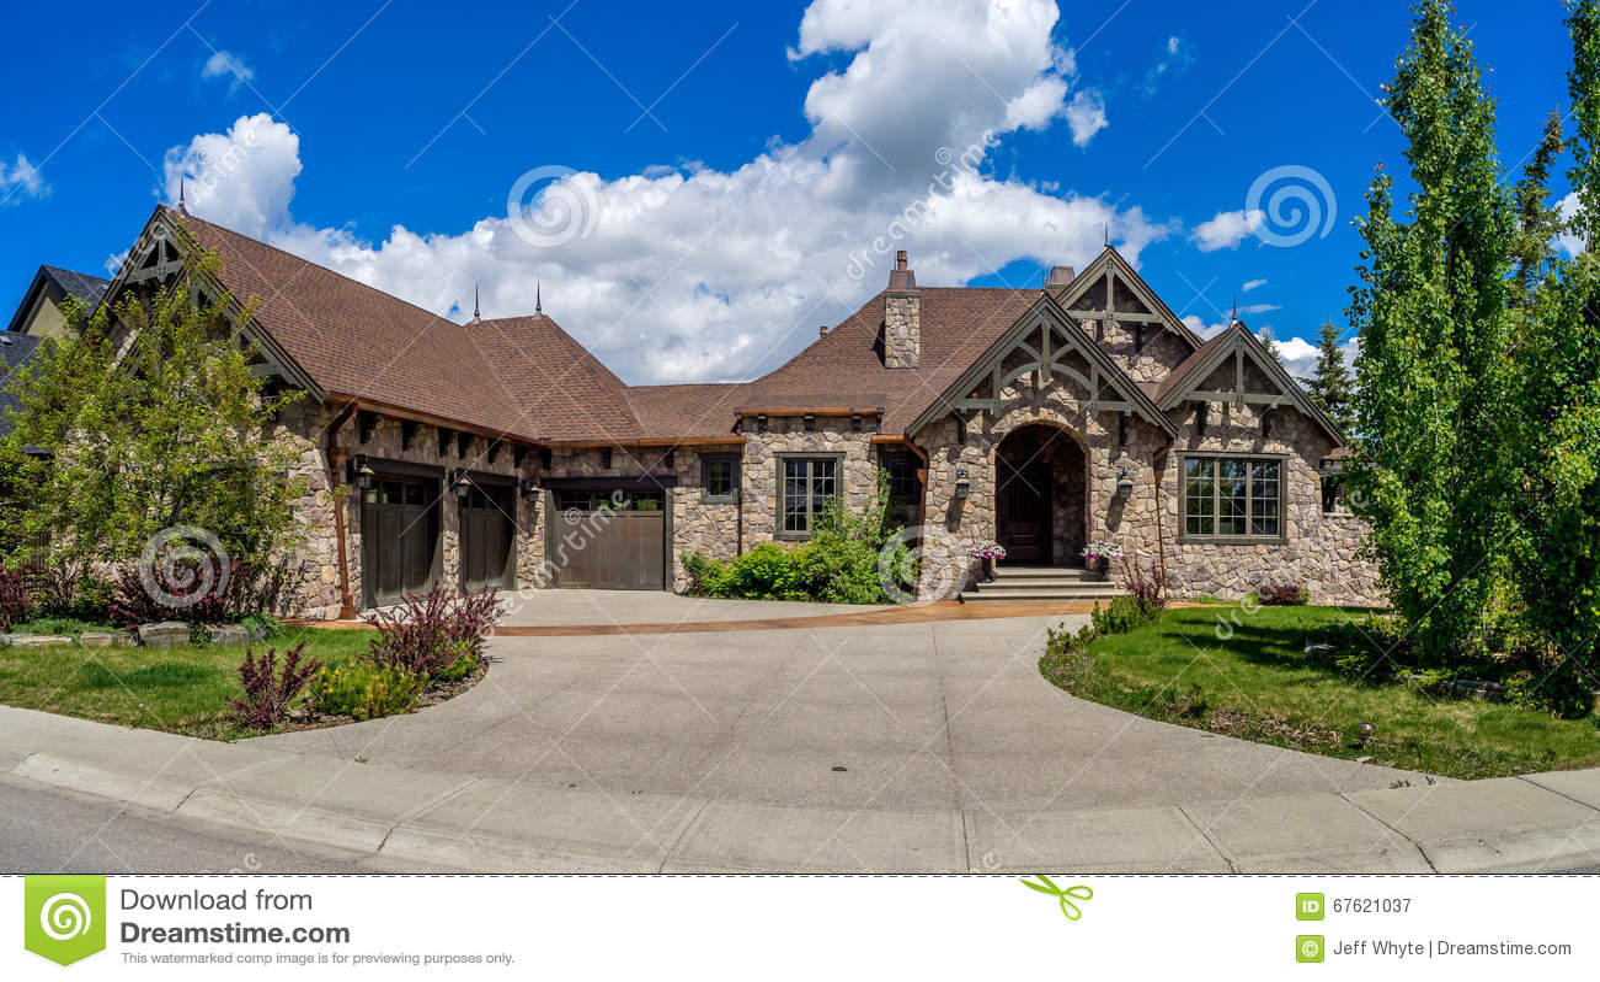 Casa luxuosa em Calgary, Canadá